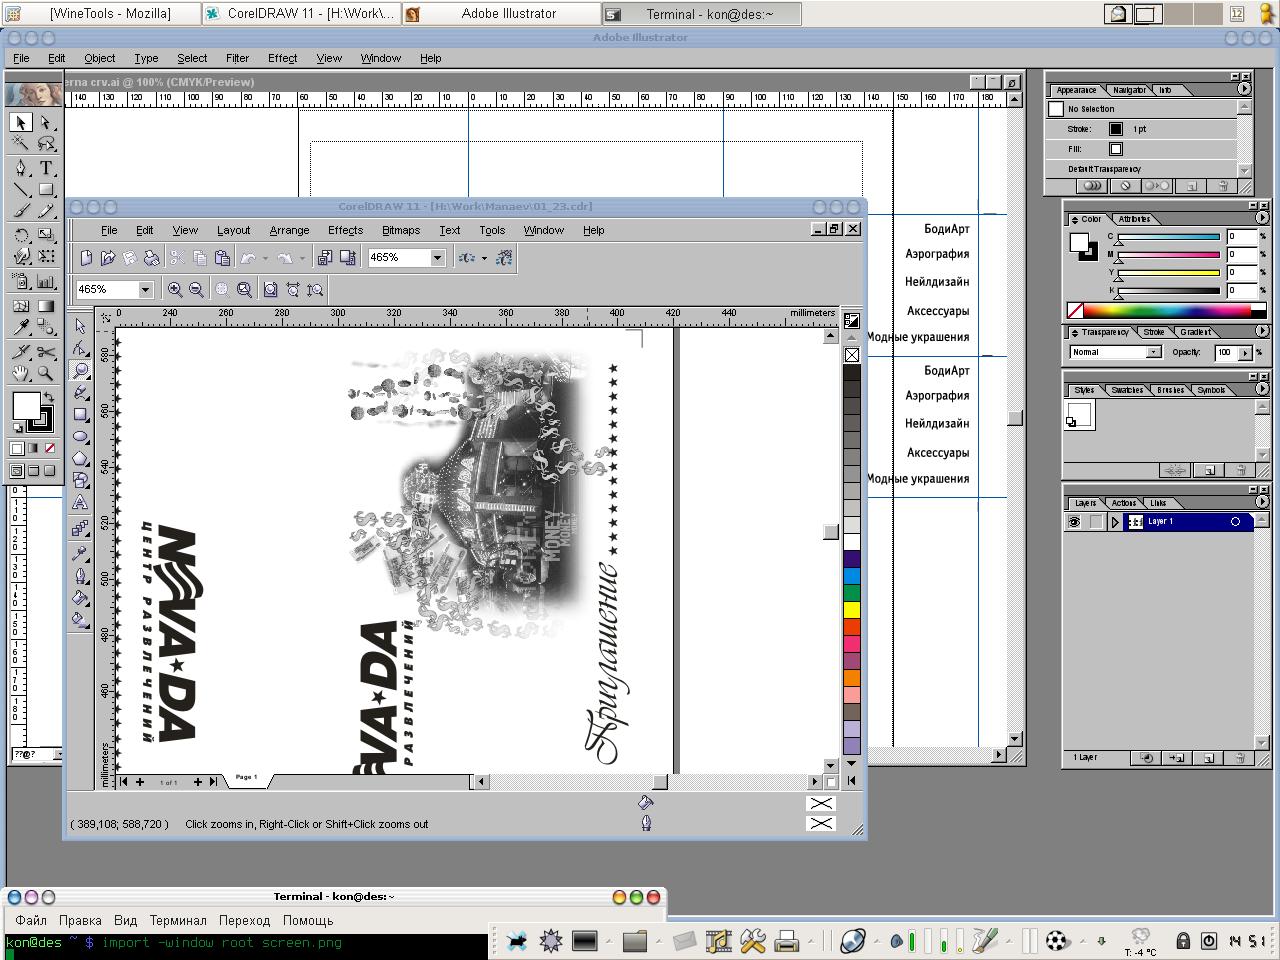 Coreldraw11 Adobe Illustrator Wine